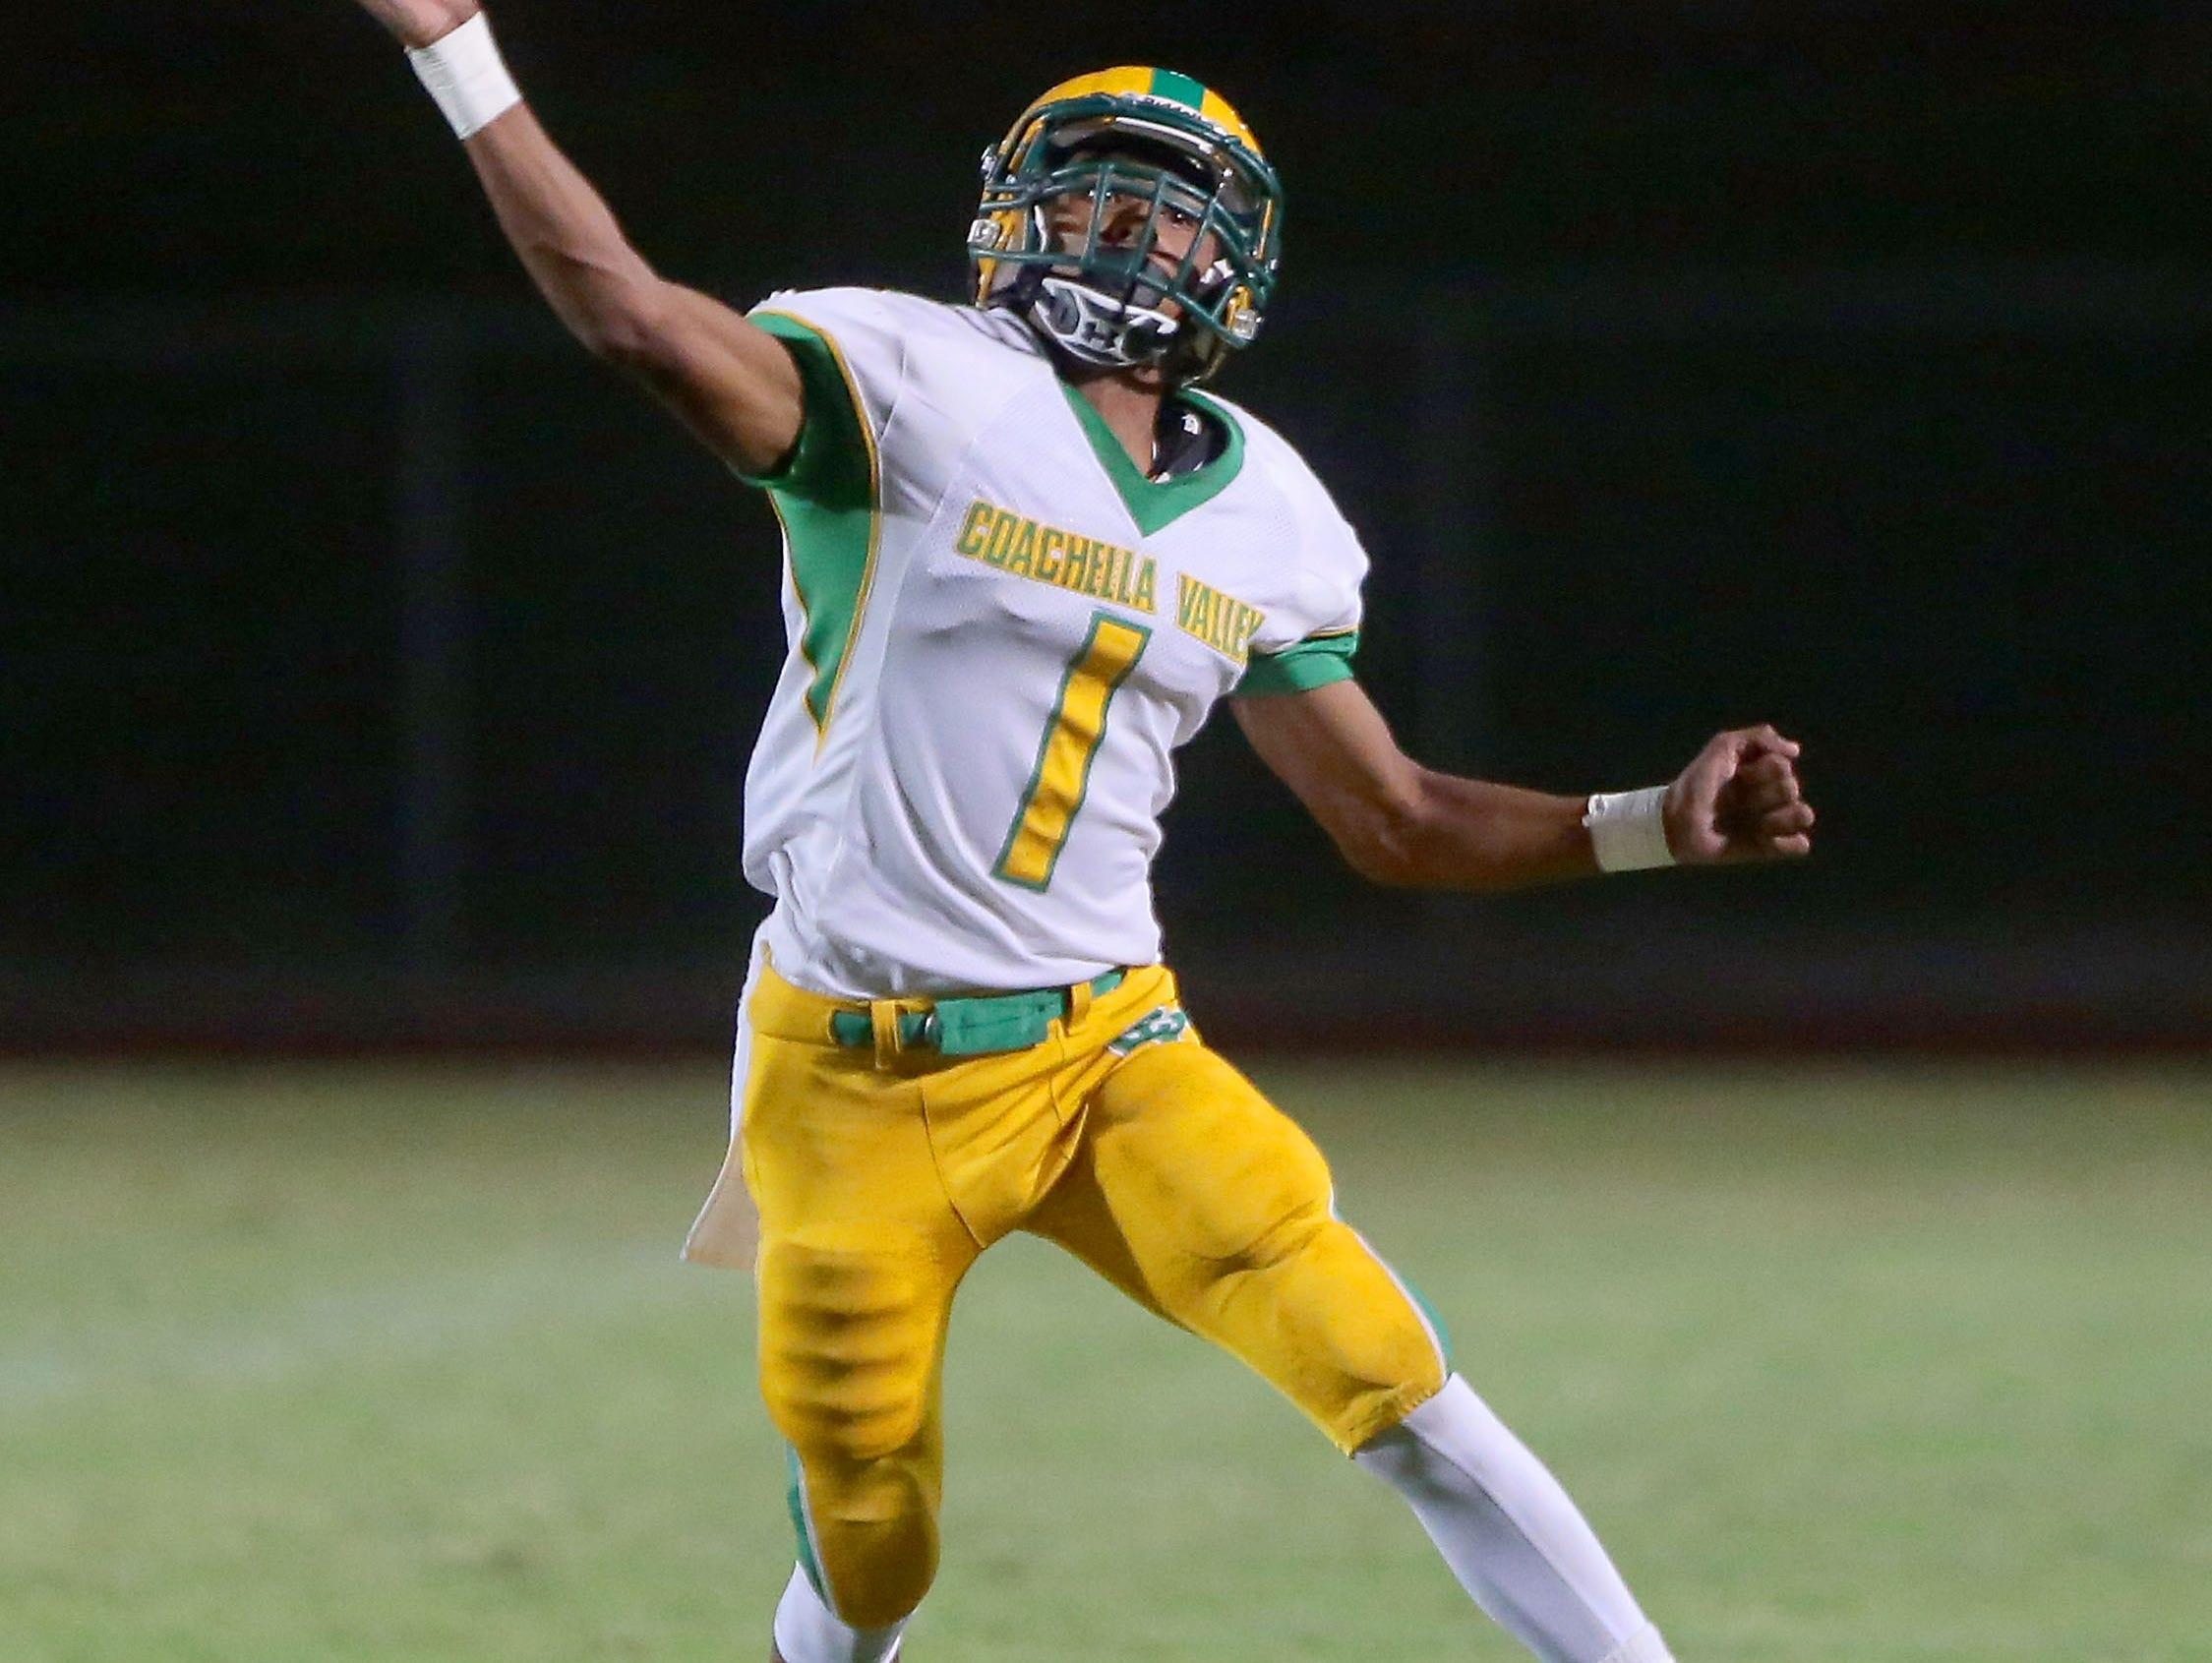 Coachella Valley quarterback Armando Deniz throws against Cathedral City, August 26, 2016.